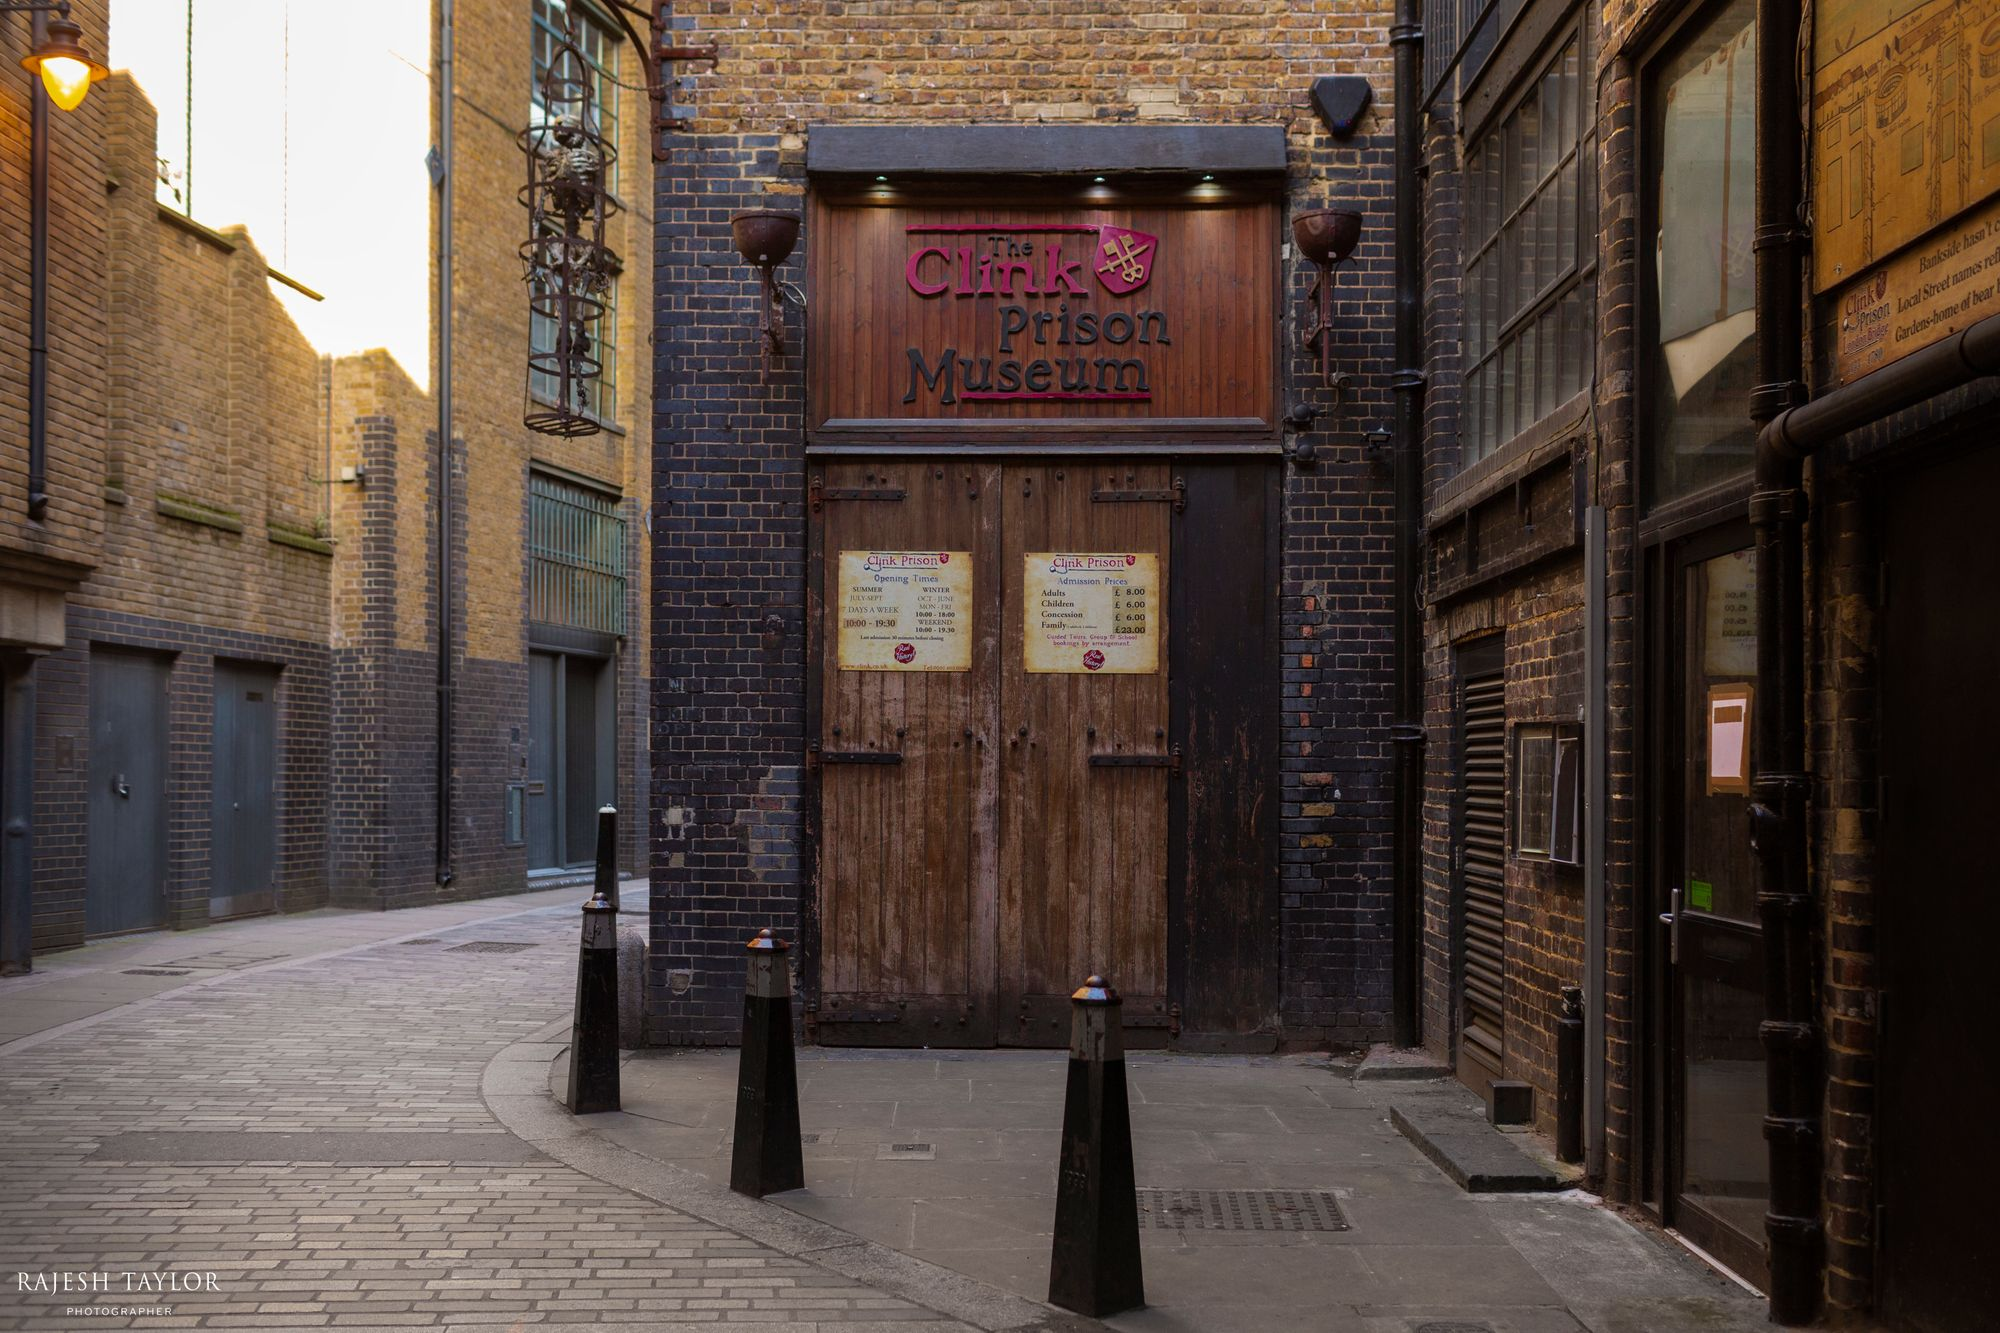 Clink Prison Museum, Southwark © Rajesh Taylor